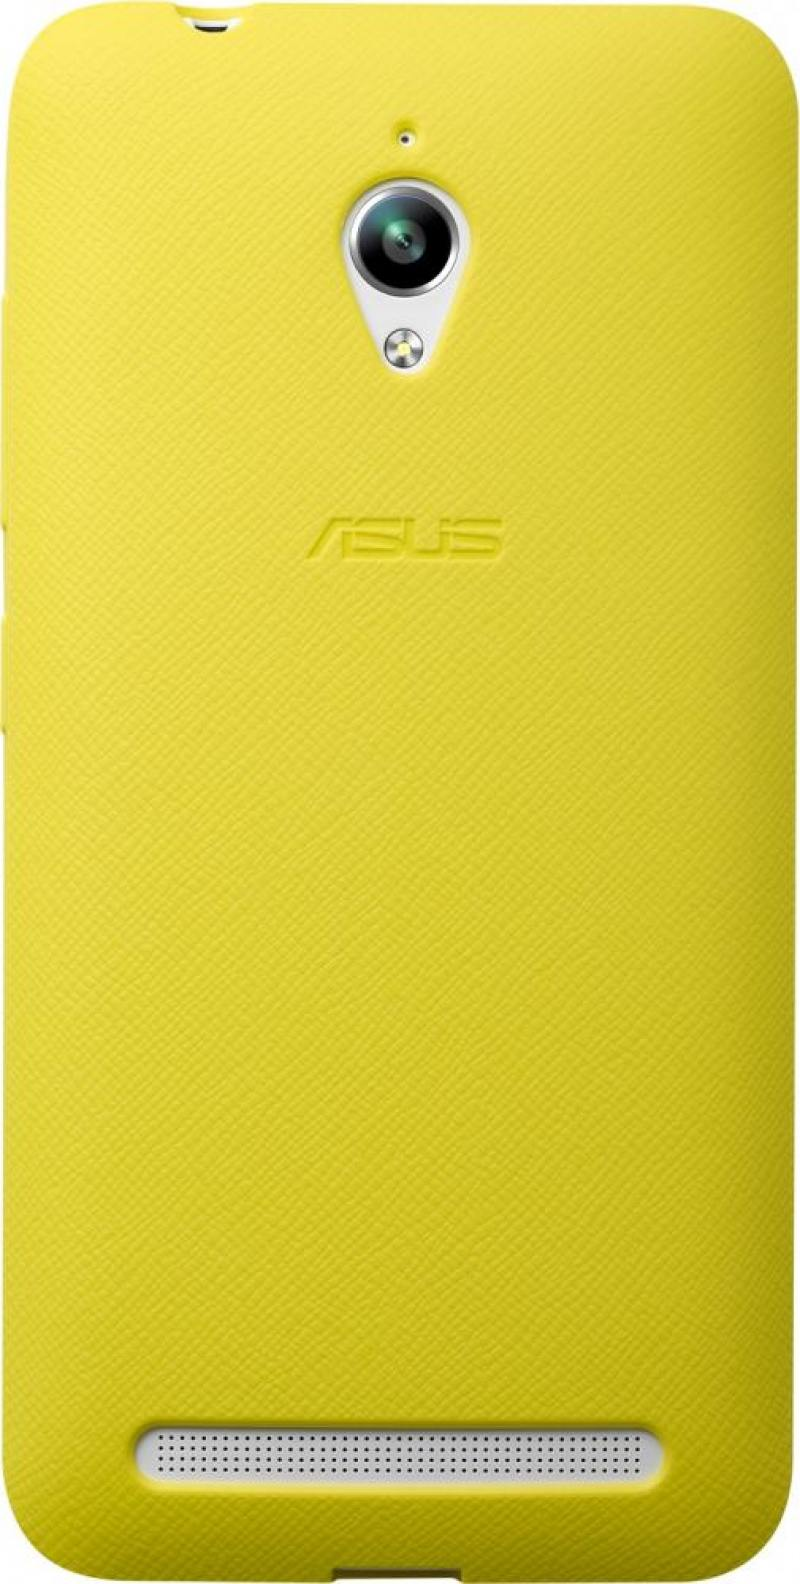 Задняя крышка Asus для ZenFone GO ZC500TG PF-01 BUMPER CASE желтый 90XB00RA-BSL3Q0 цена